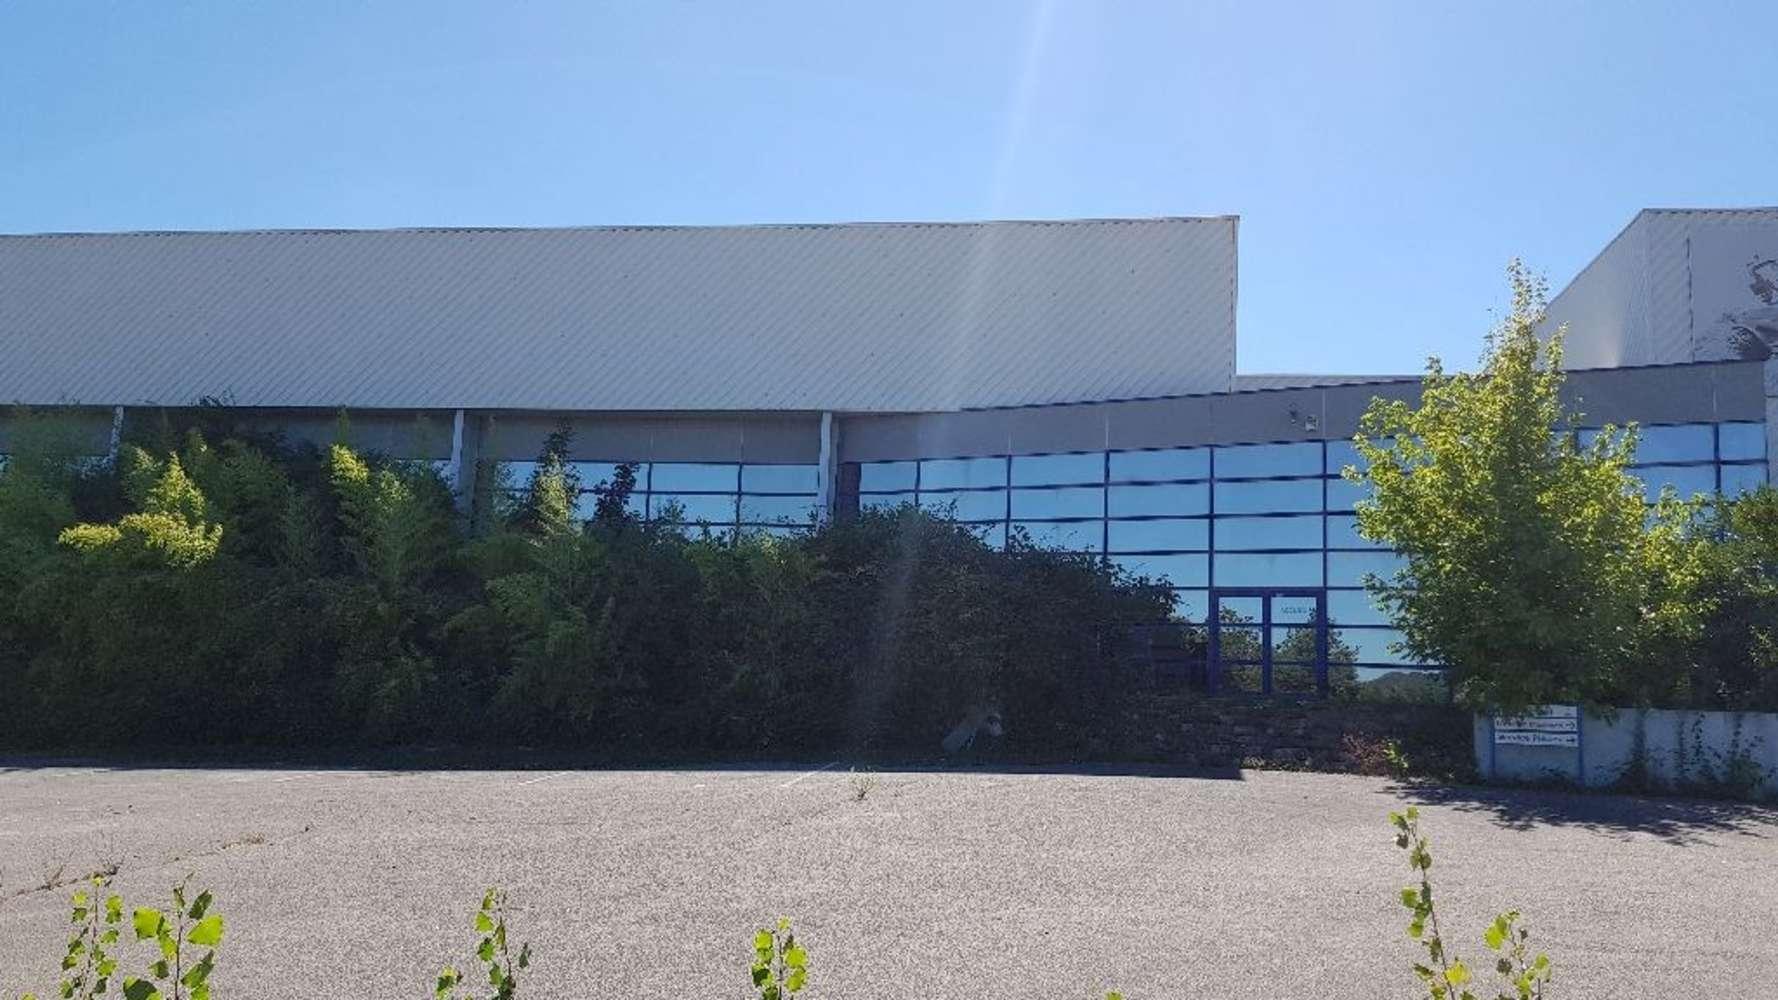 Activités/entrepôt Vaulx milieu, 38090 - Entrepot à vendre Lyon - Vaulx Milieu - 10471419